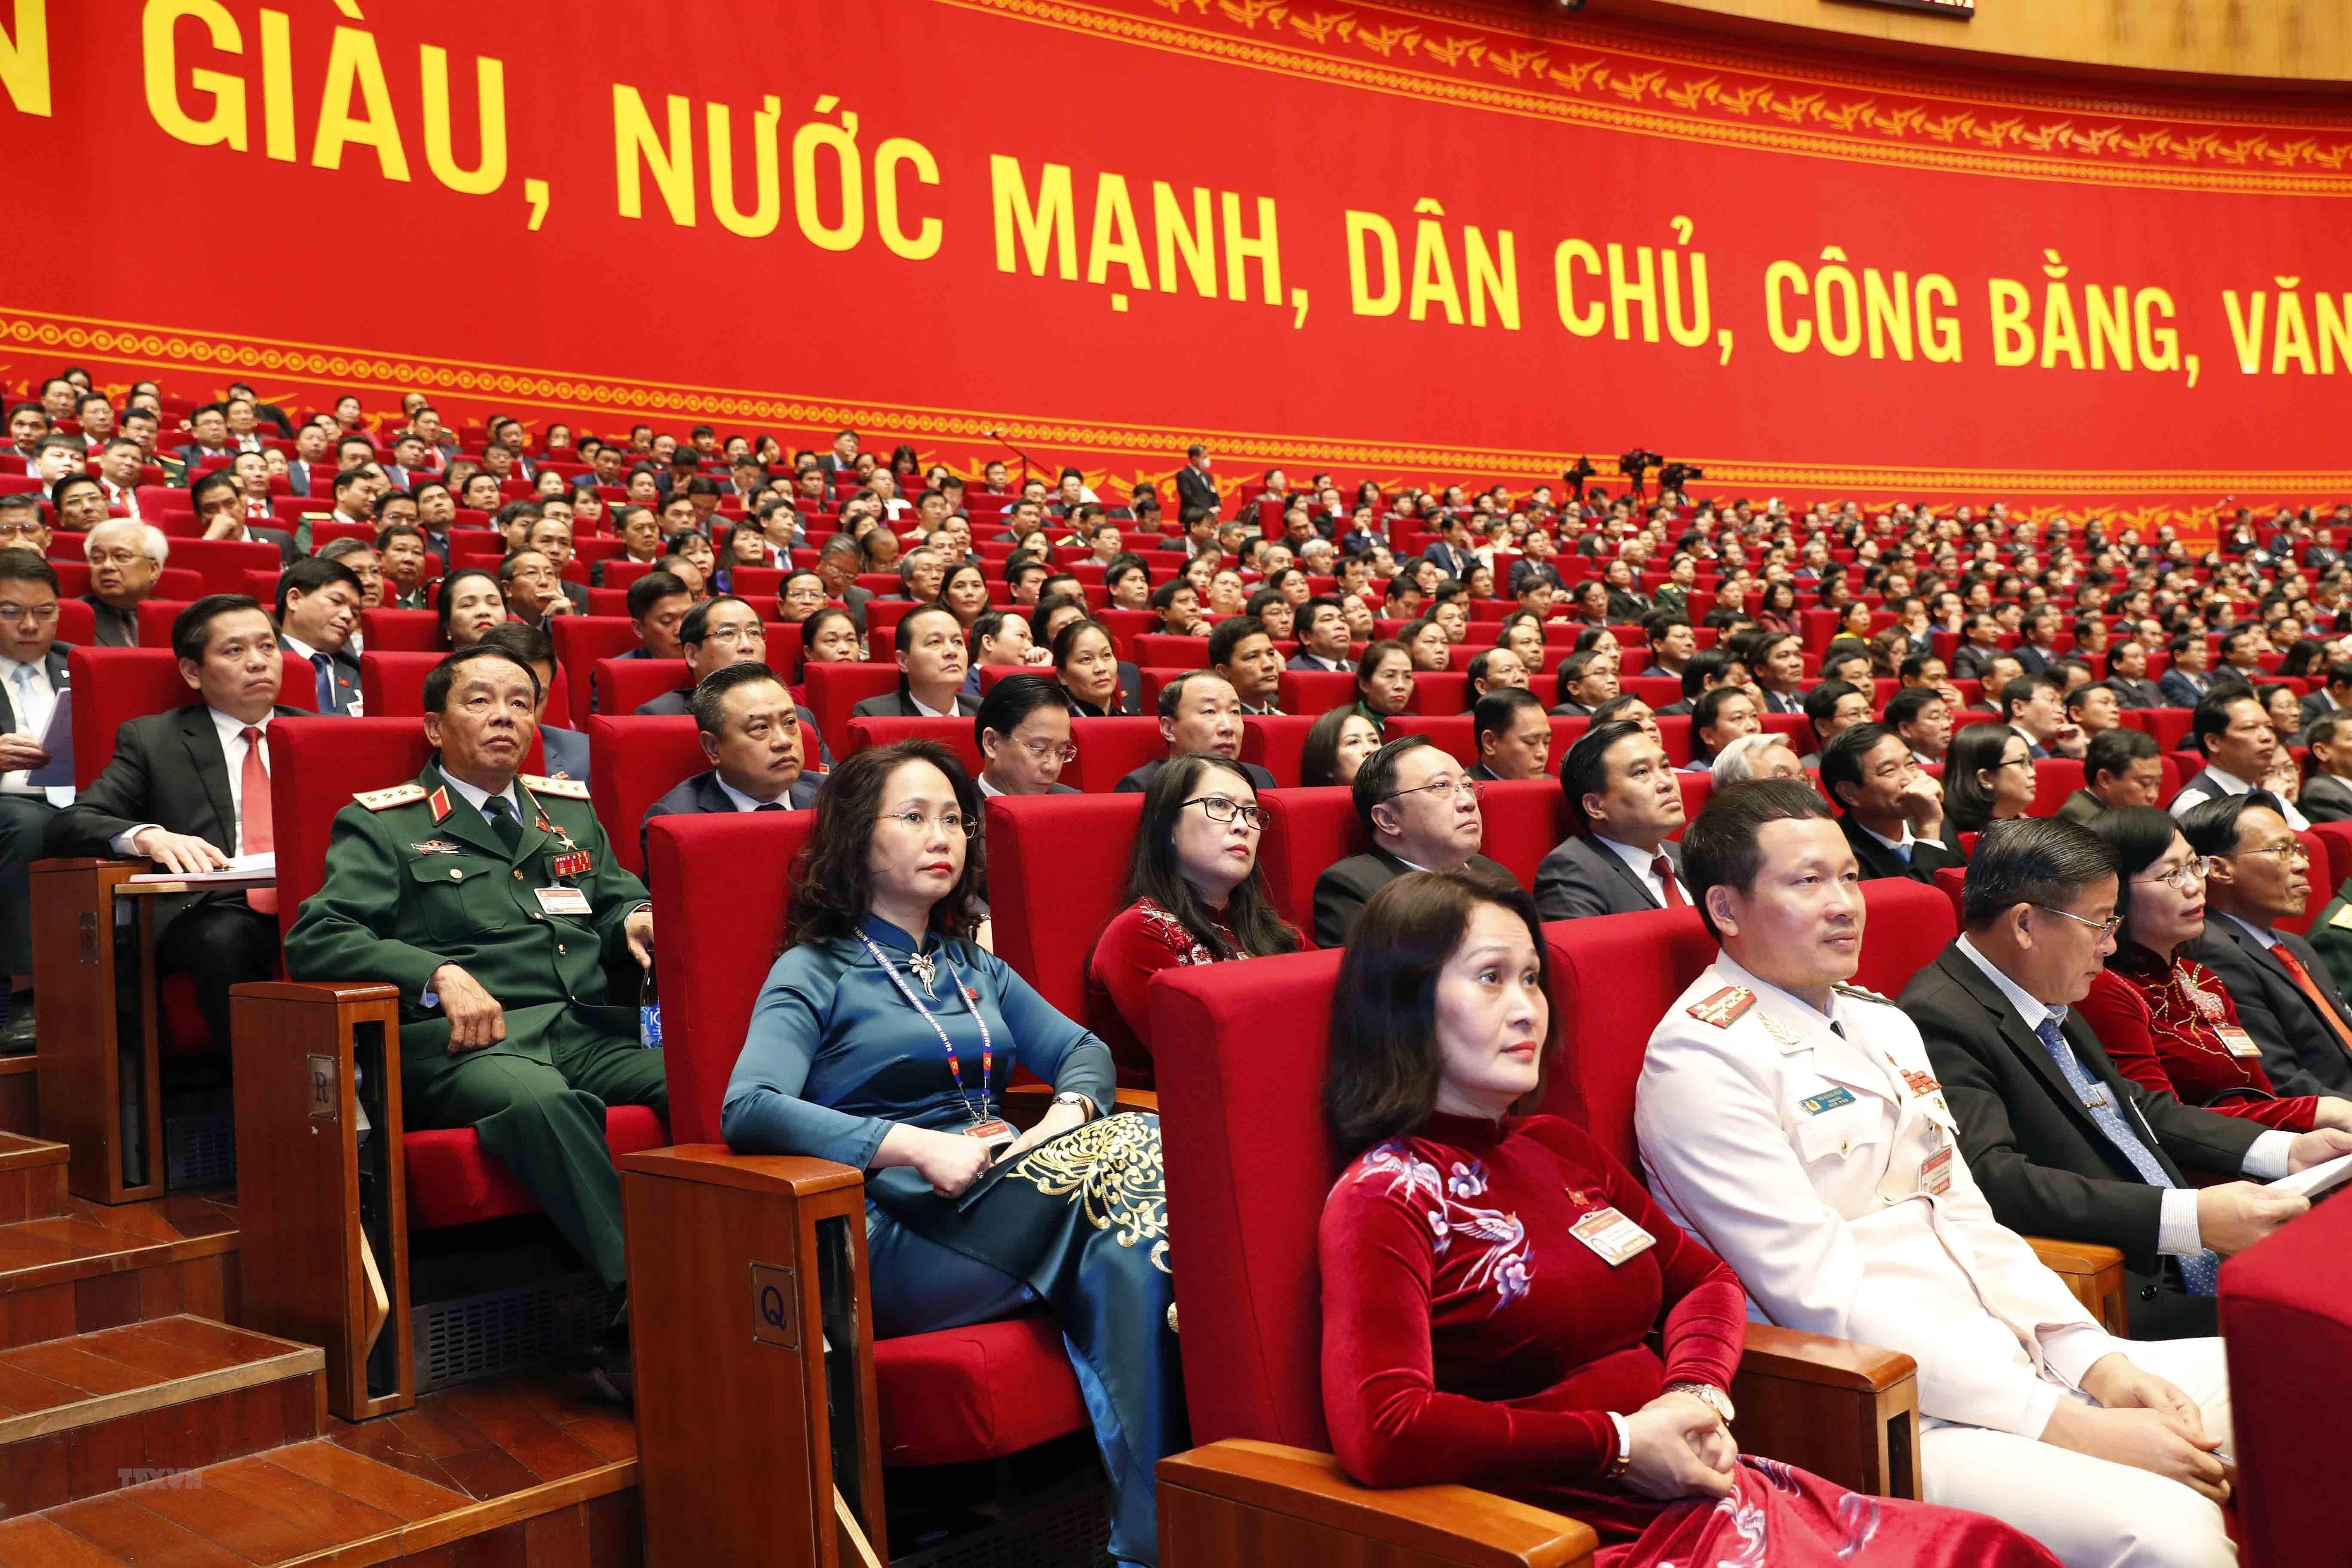 [Photo] Quang canh phien thao luan cac van kien Dai hoi XIII cua Dang hinh anh 17